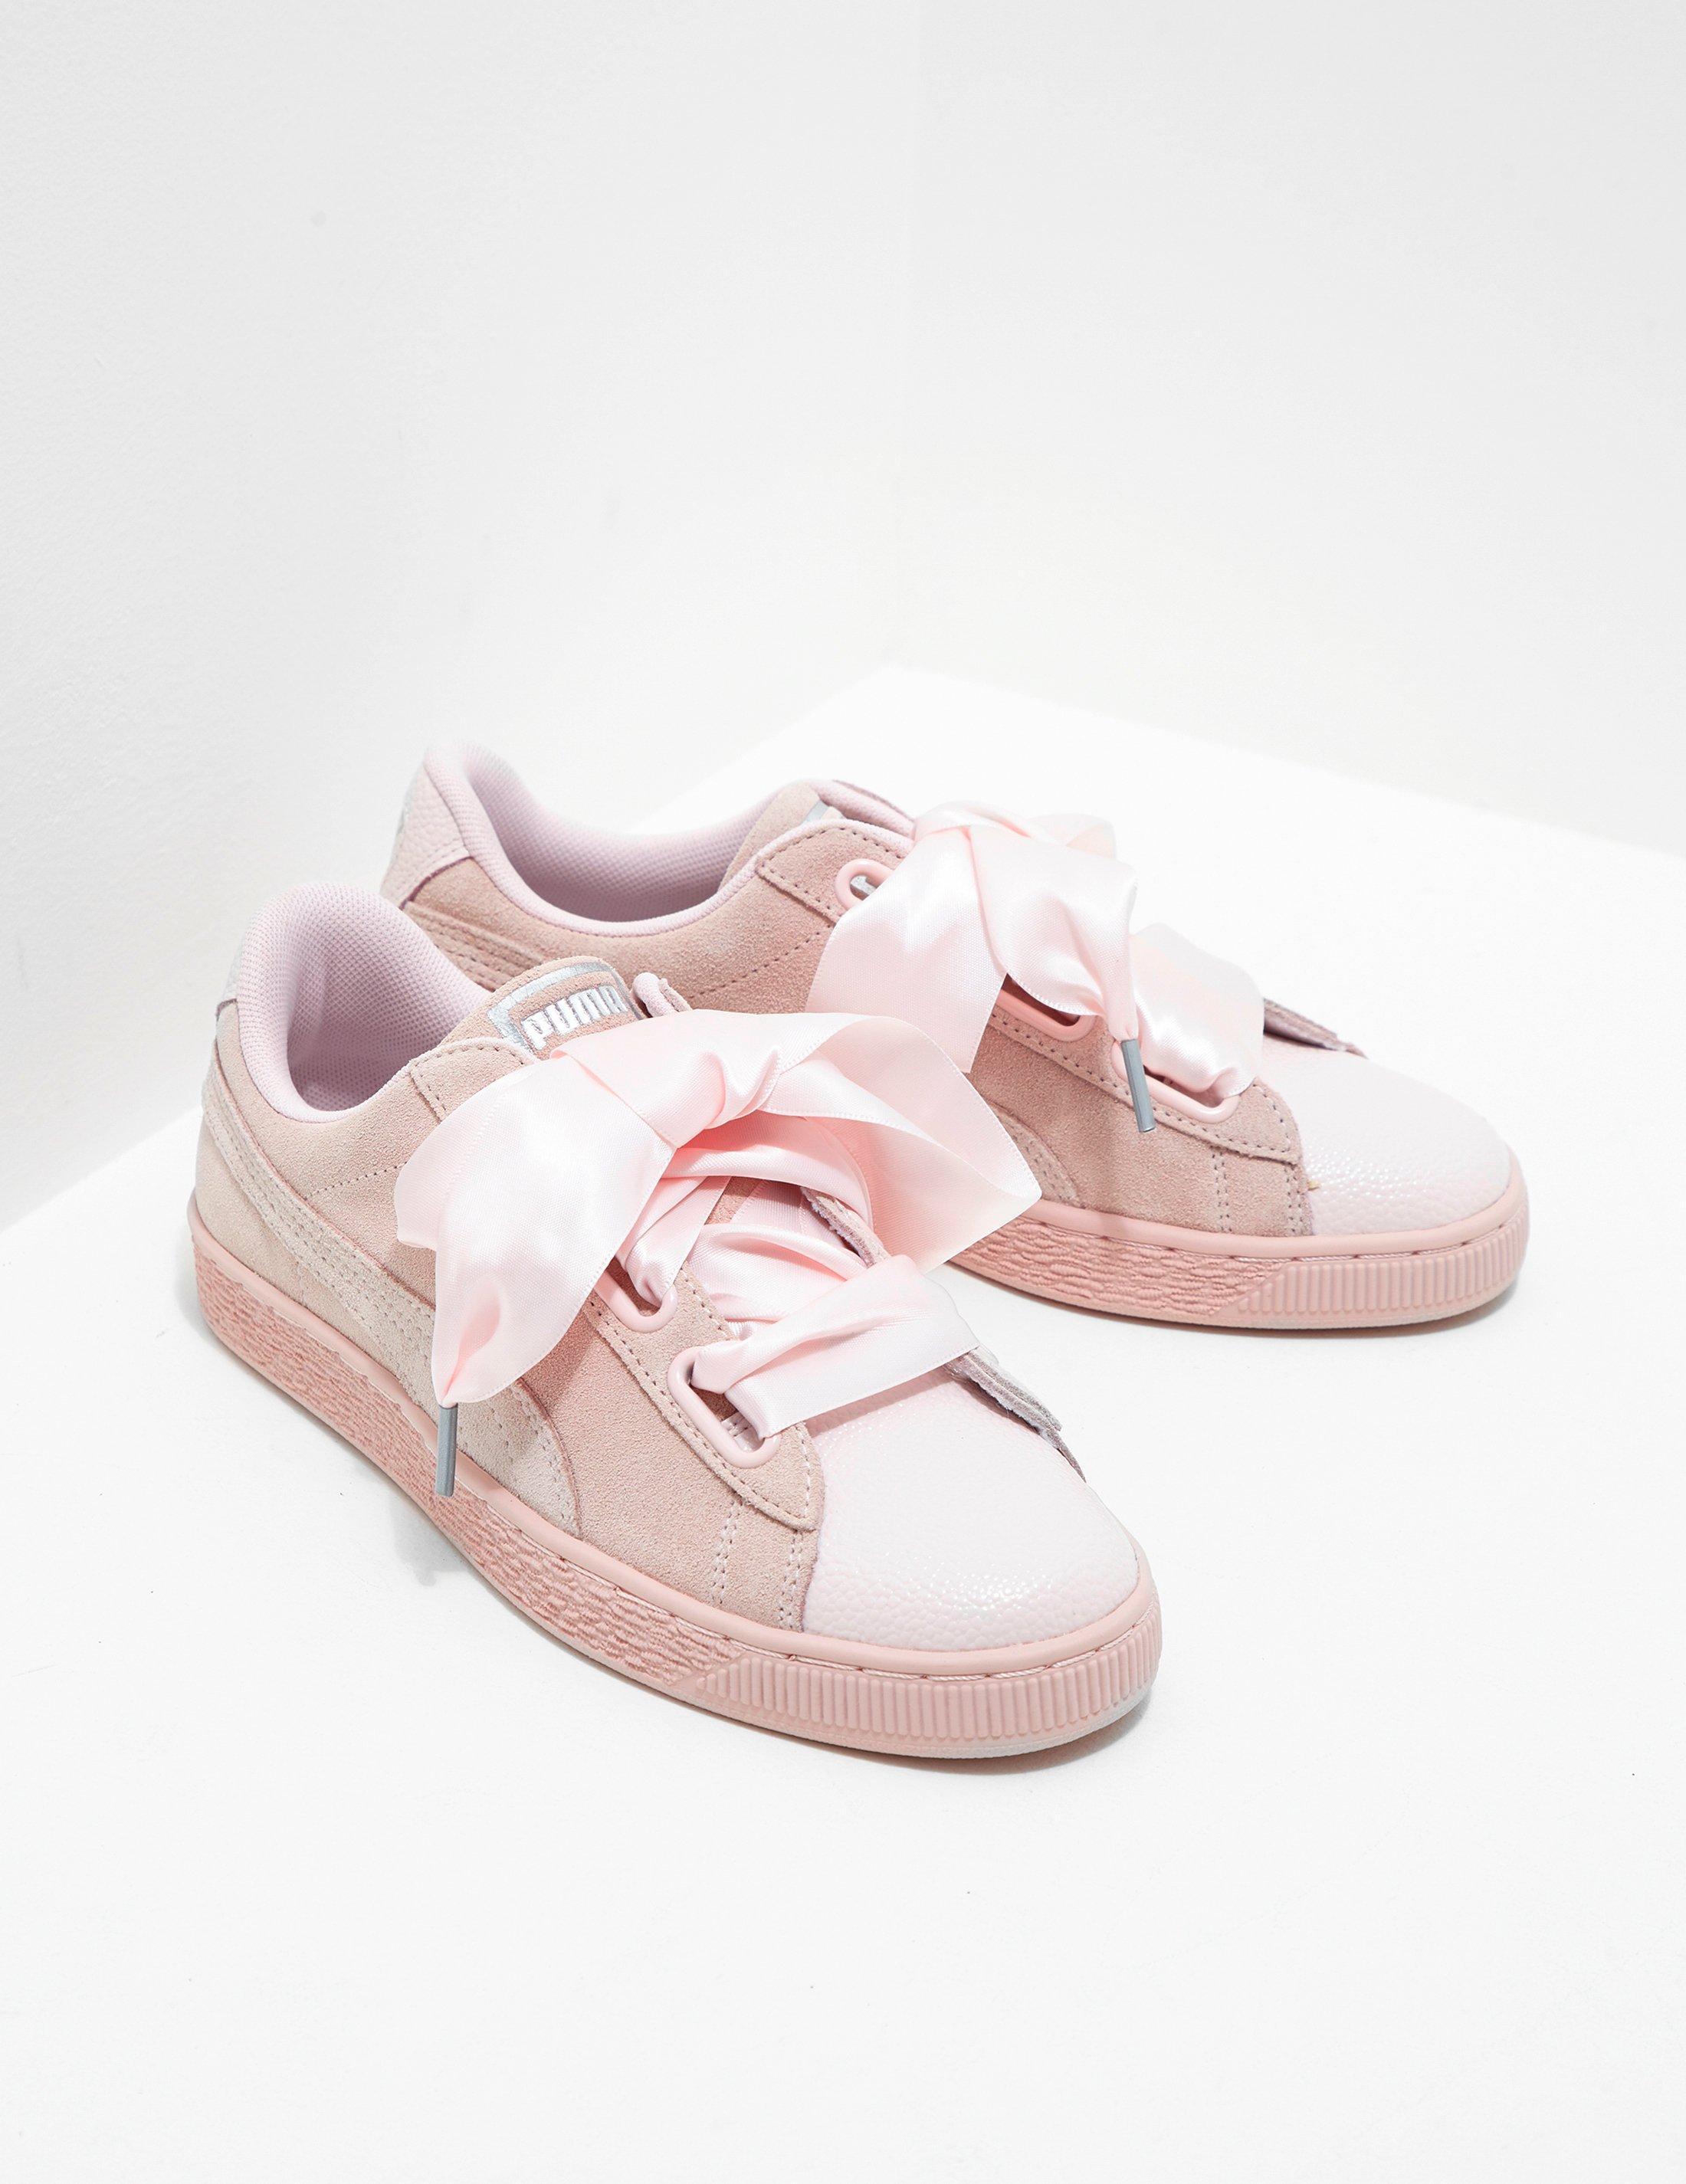 quality design a1d22 68153 PUMA Womens Suede Heart Bubble Pink